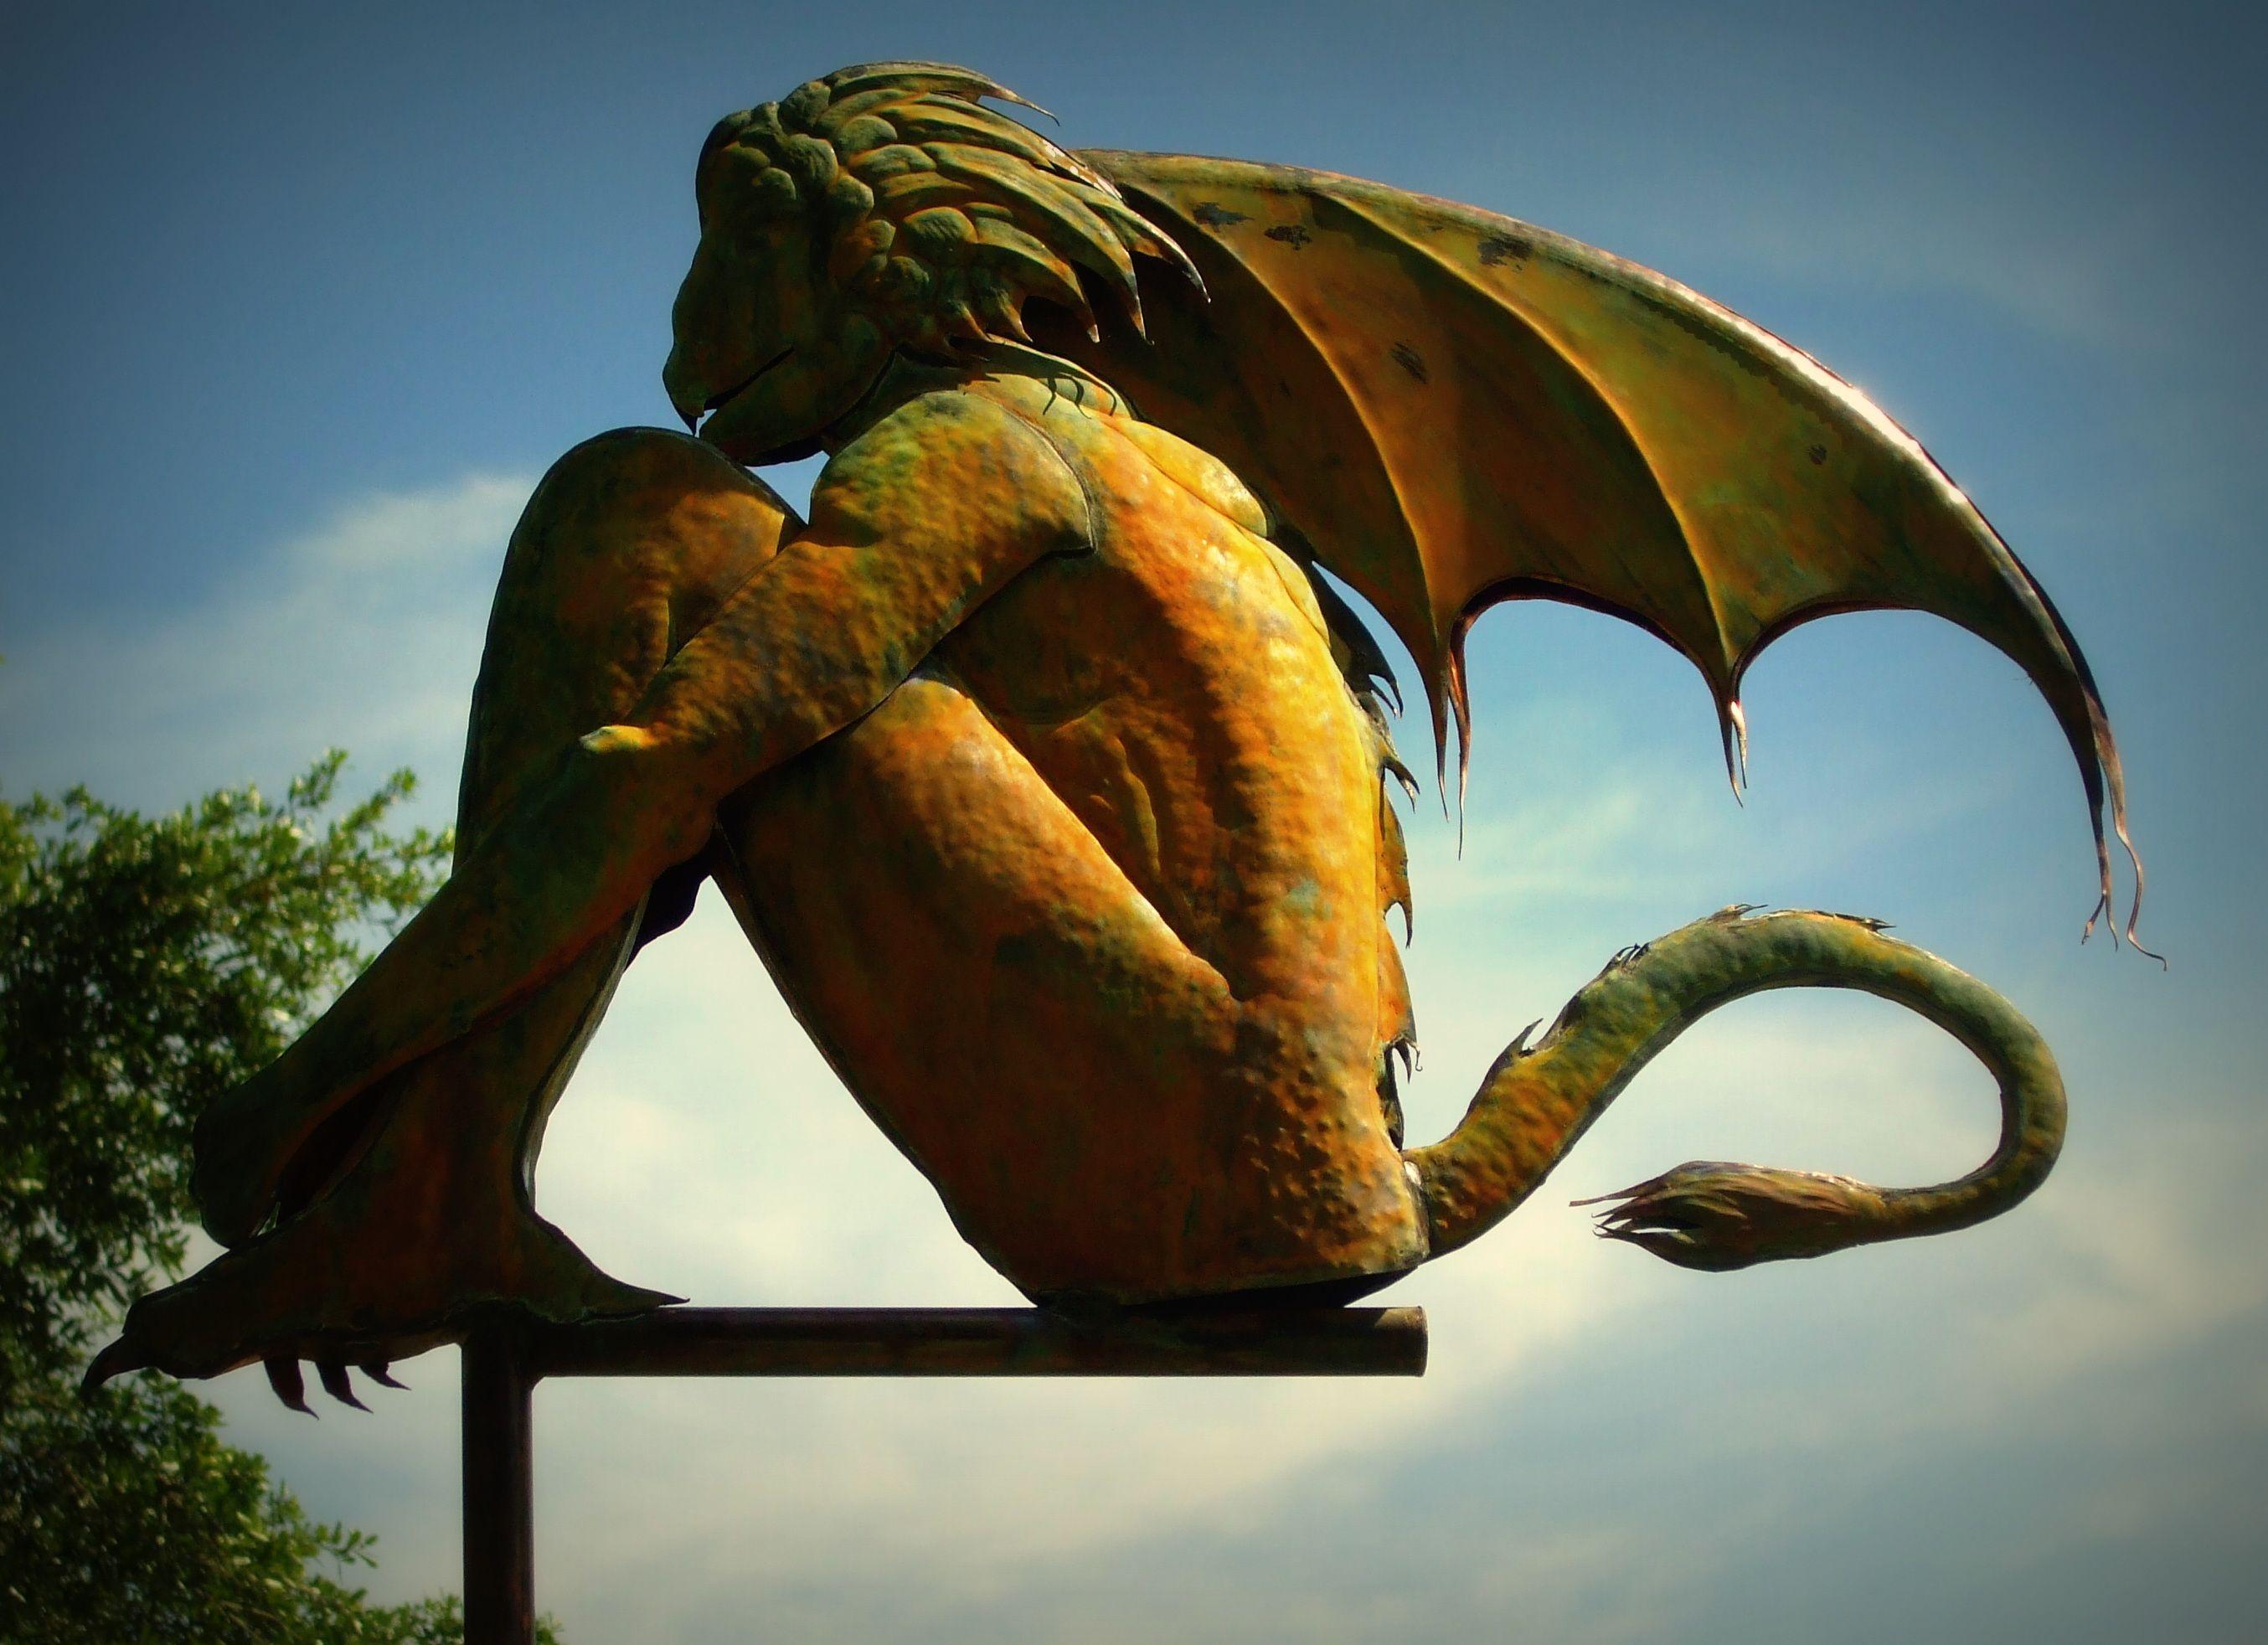 Handmade Gargoyle Weathervane By David Smith By David